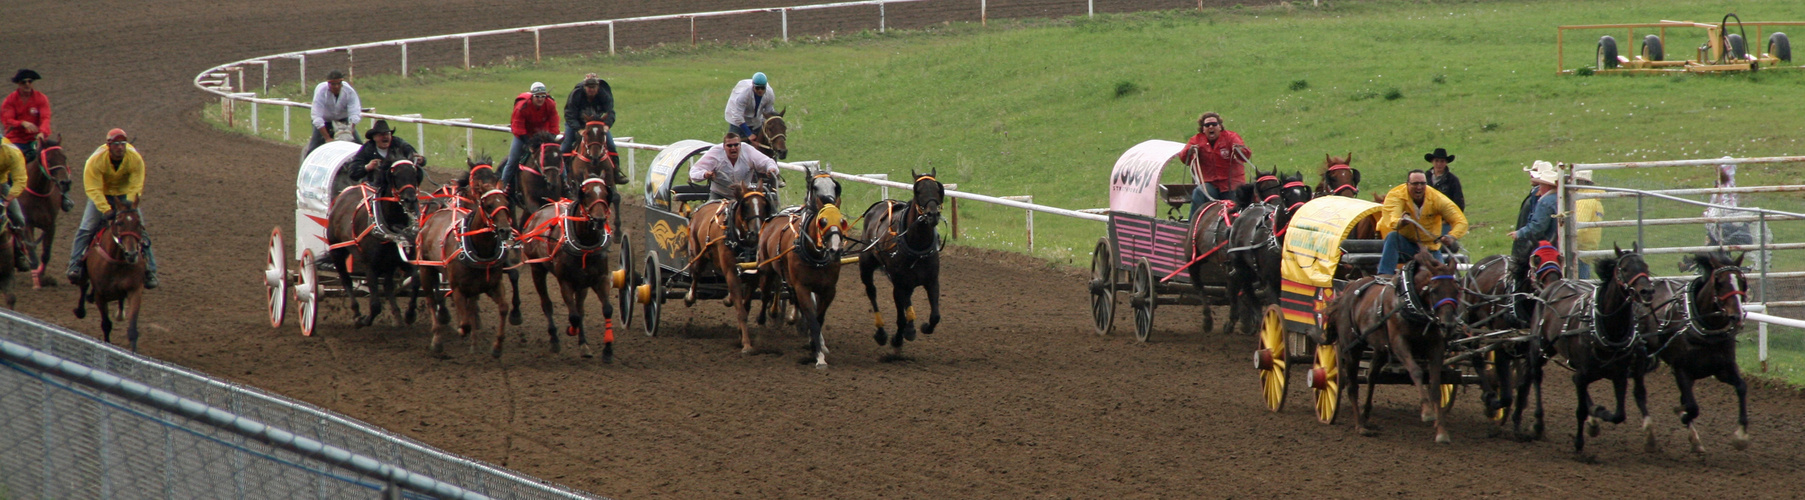 Chuckwagon Race